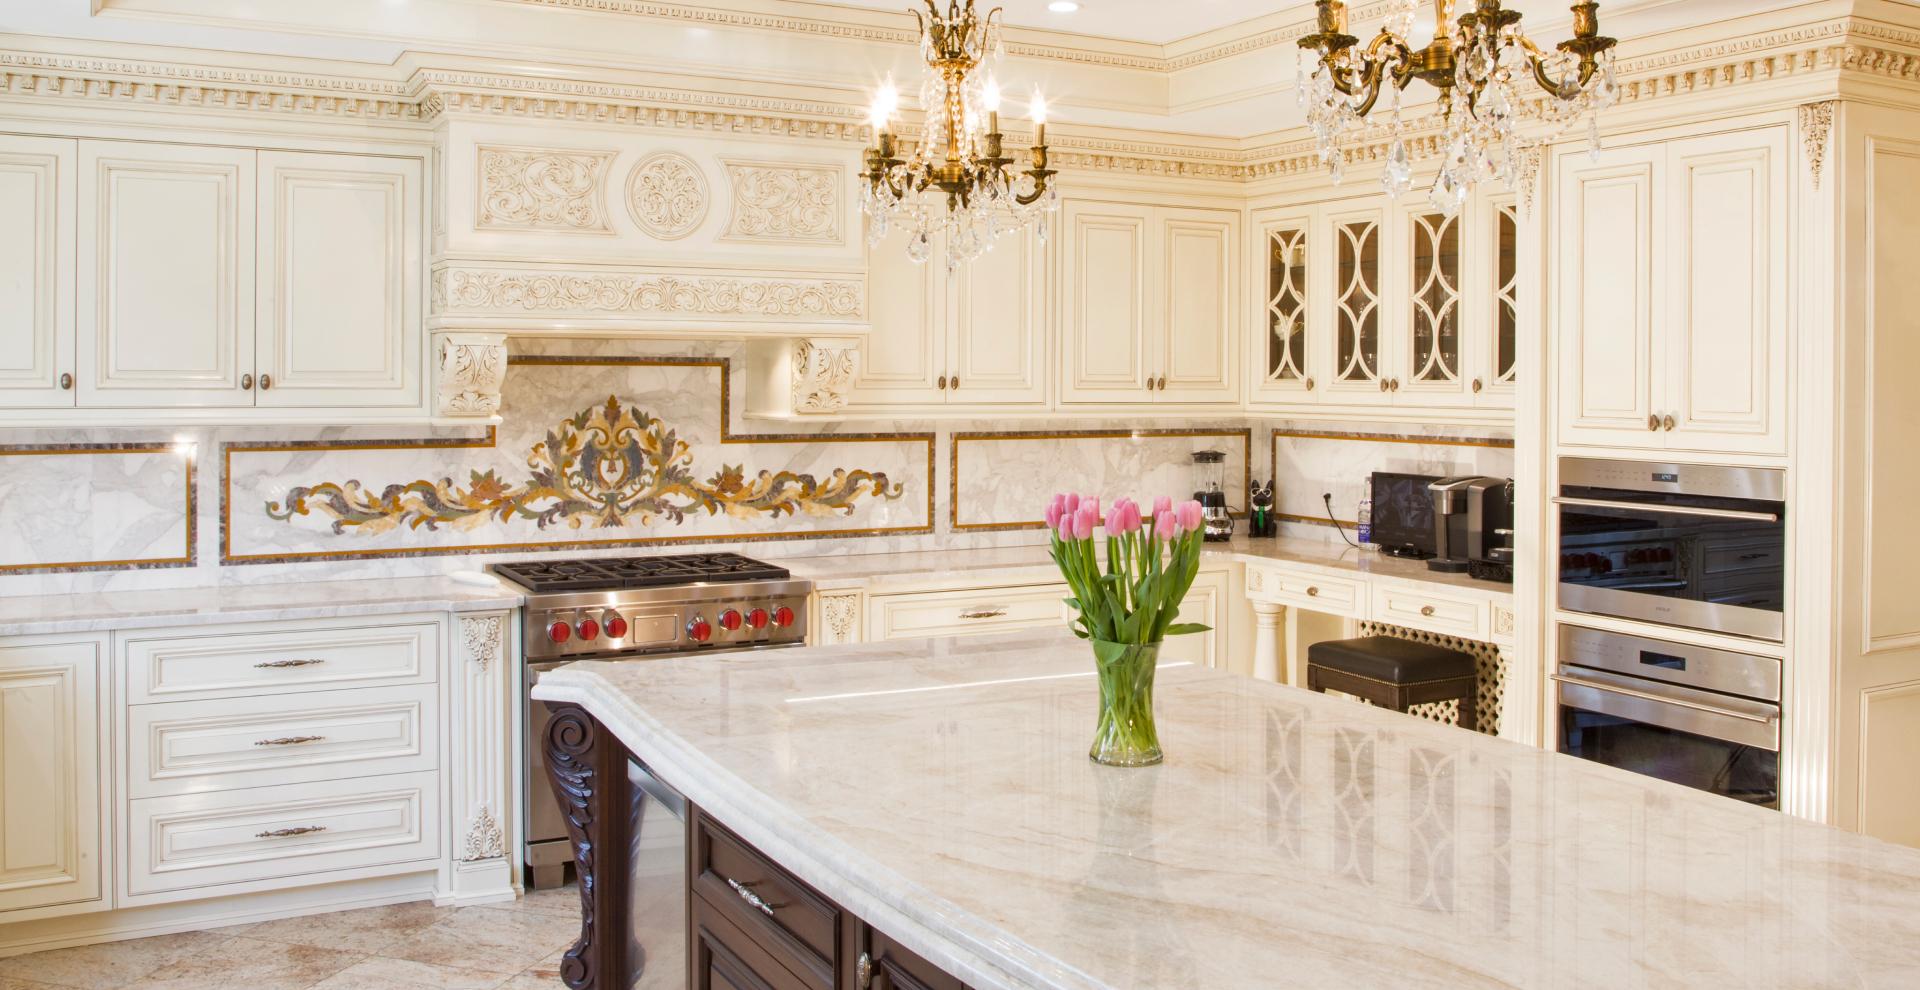 Traditional white patina kitchen Whitestone, NY